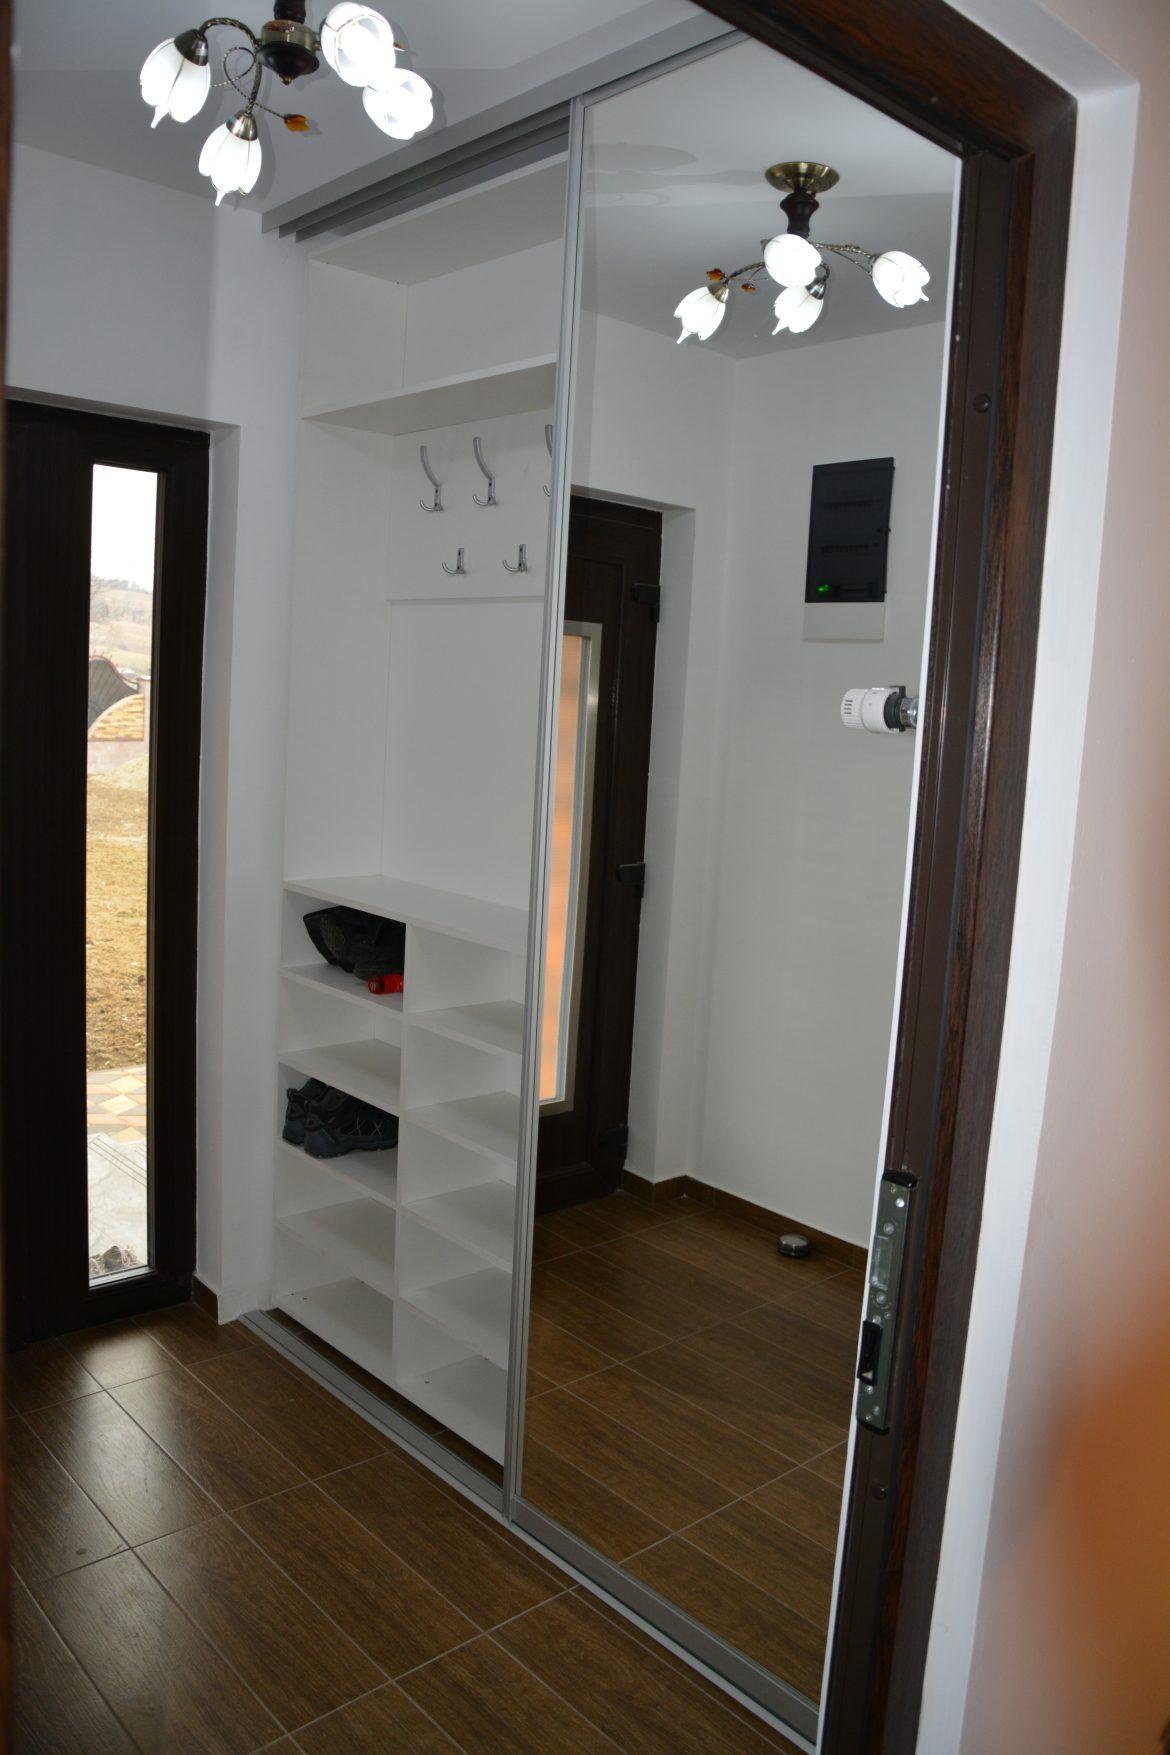 dressing-hol-incastrat-in-perete-realizat-din-pal-alb-cu-profil-usi-din-dur-aluminiu-cu-compartimentare-interioara-pentru-depozitat-diverse-si-cuier